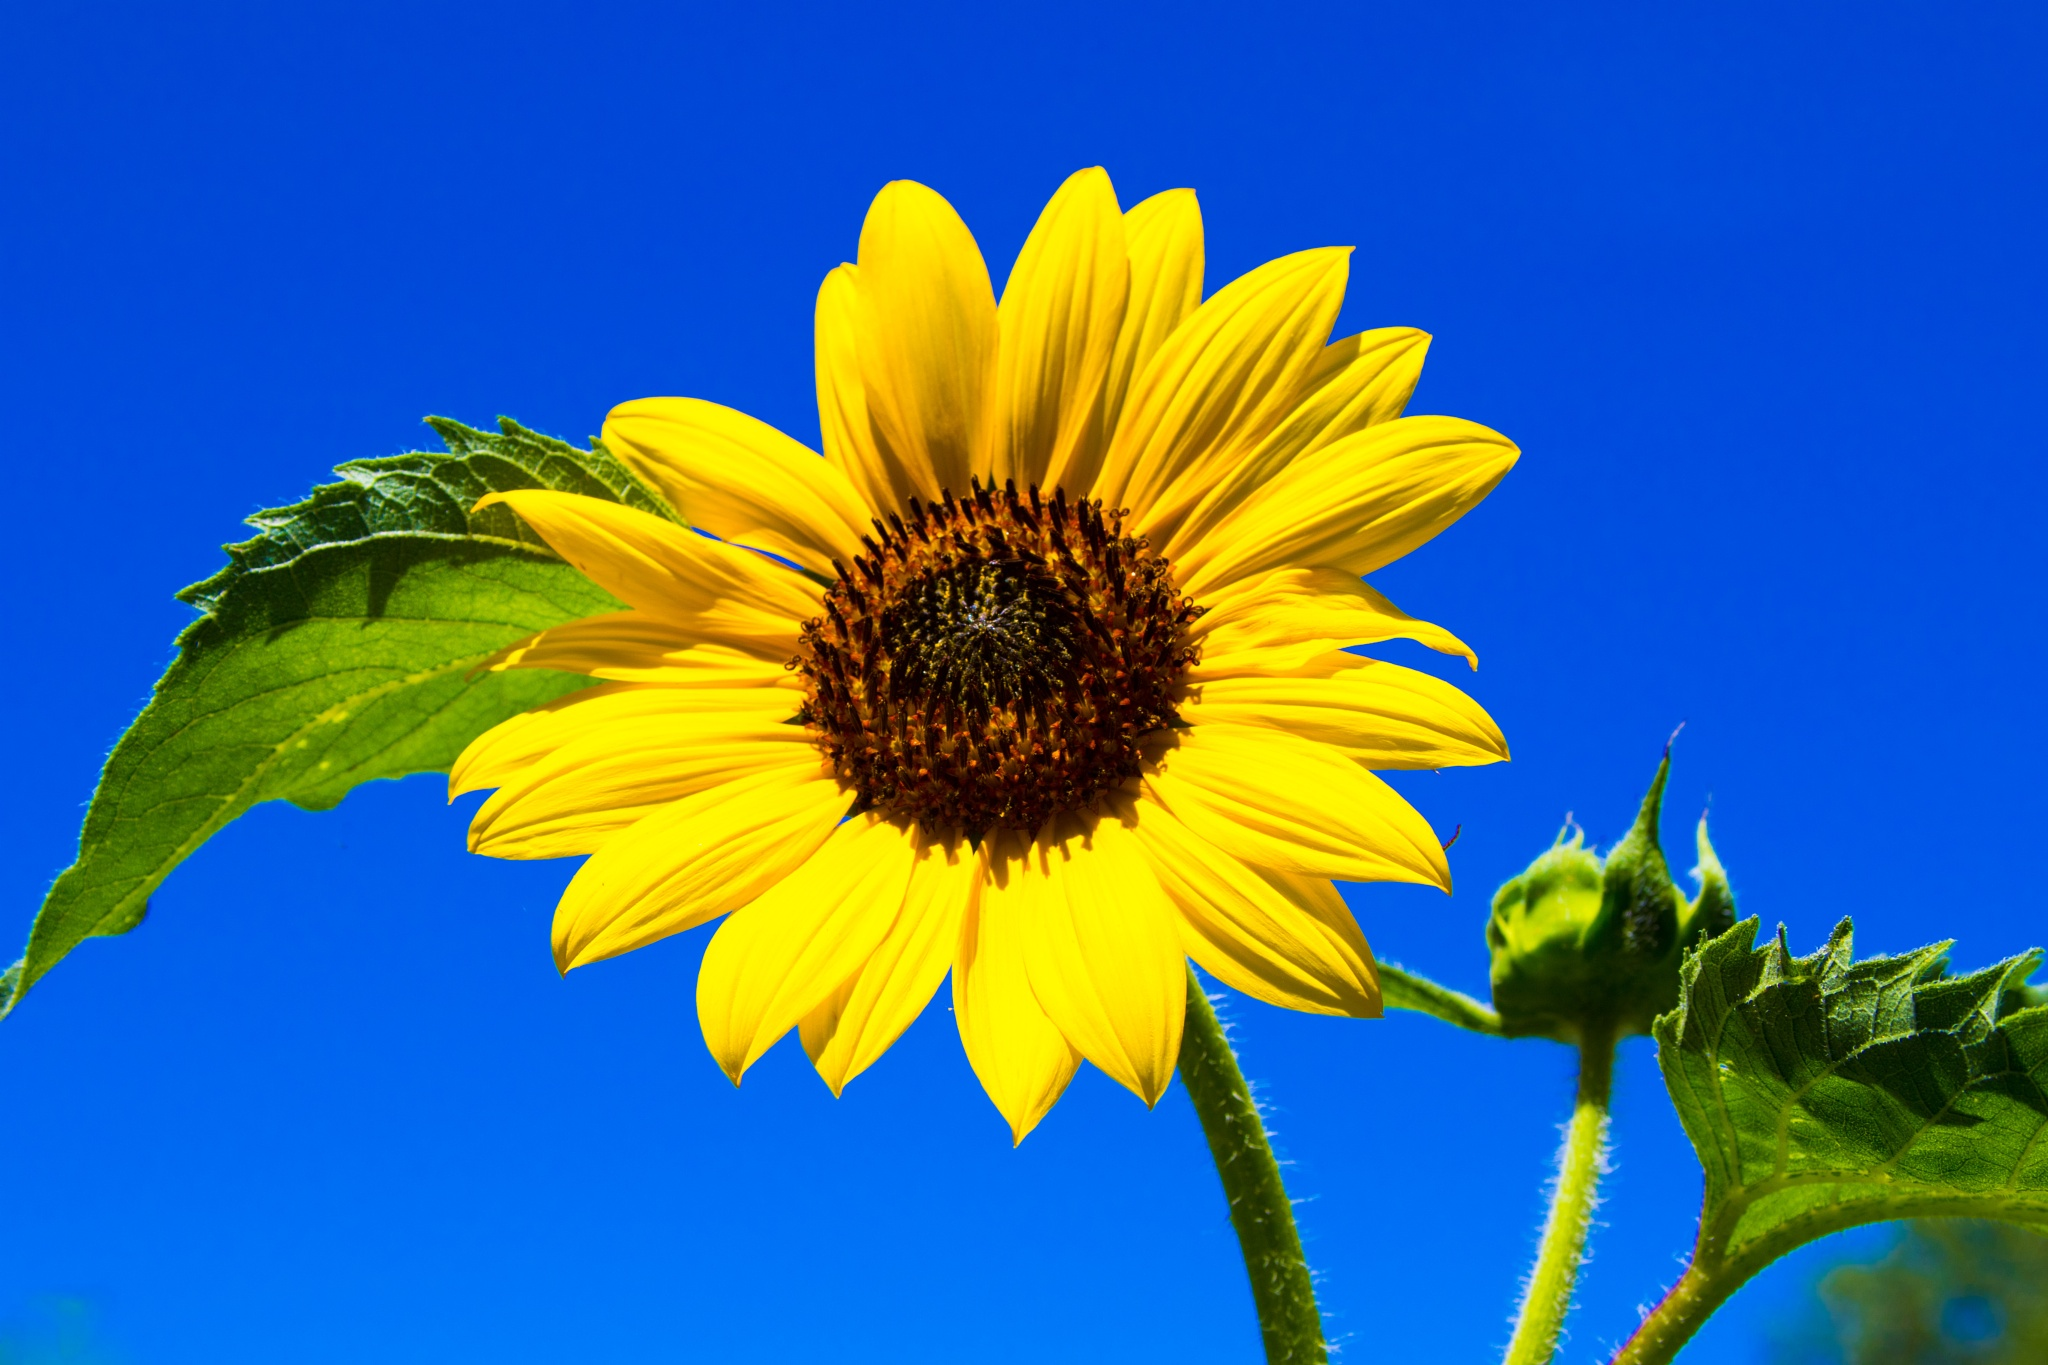 Sunflower by ejk41